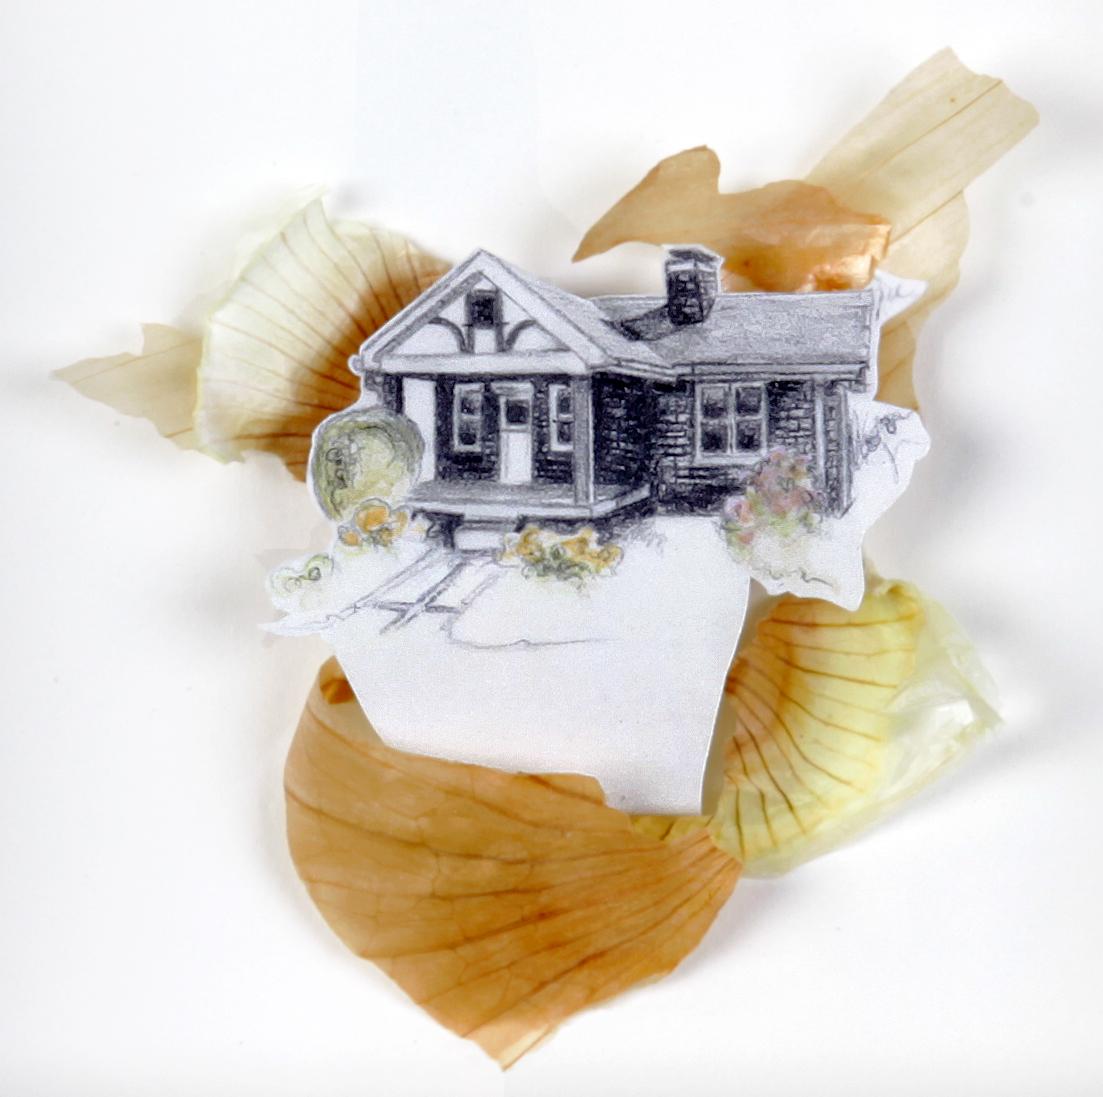 This House is Fragile.jpg